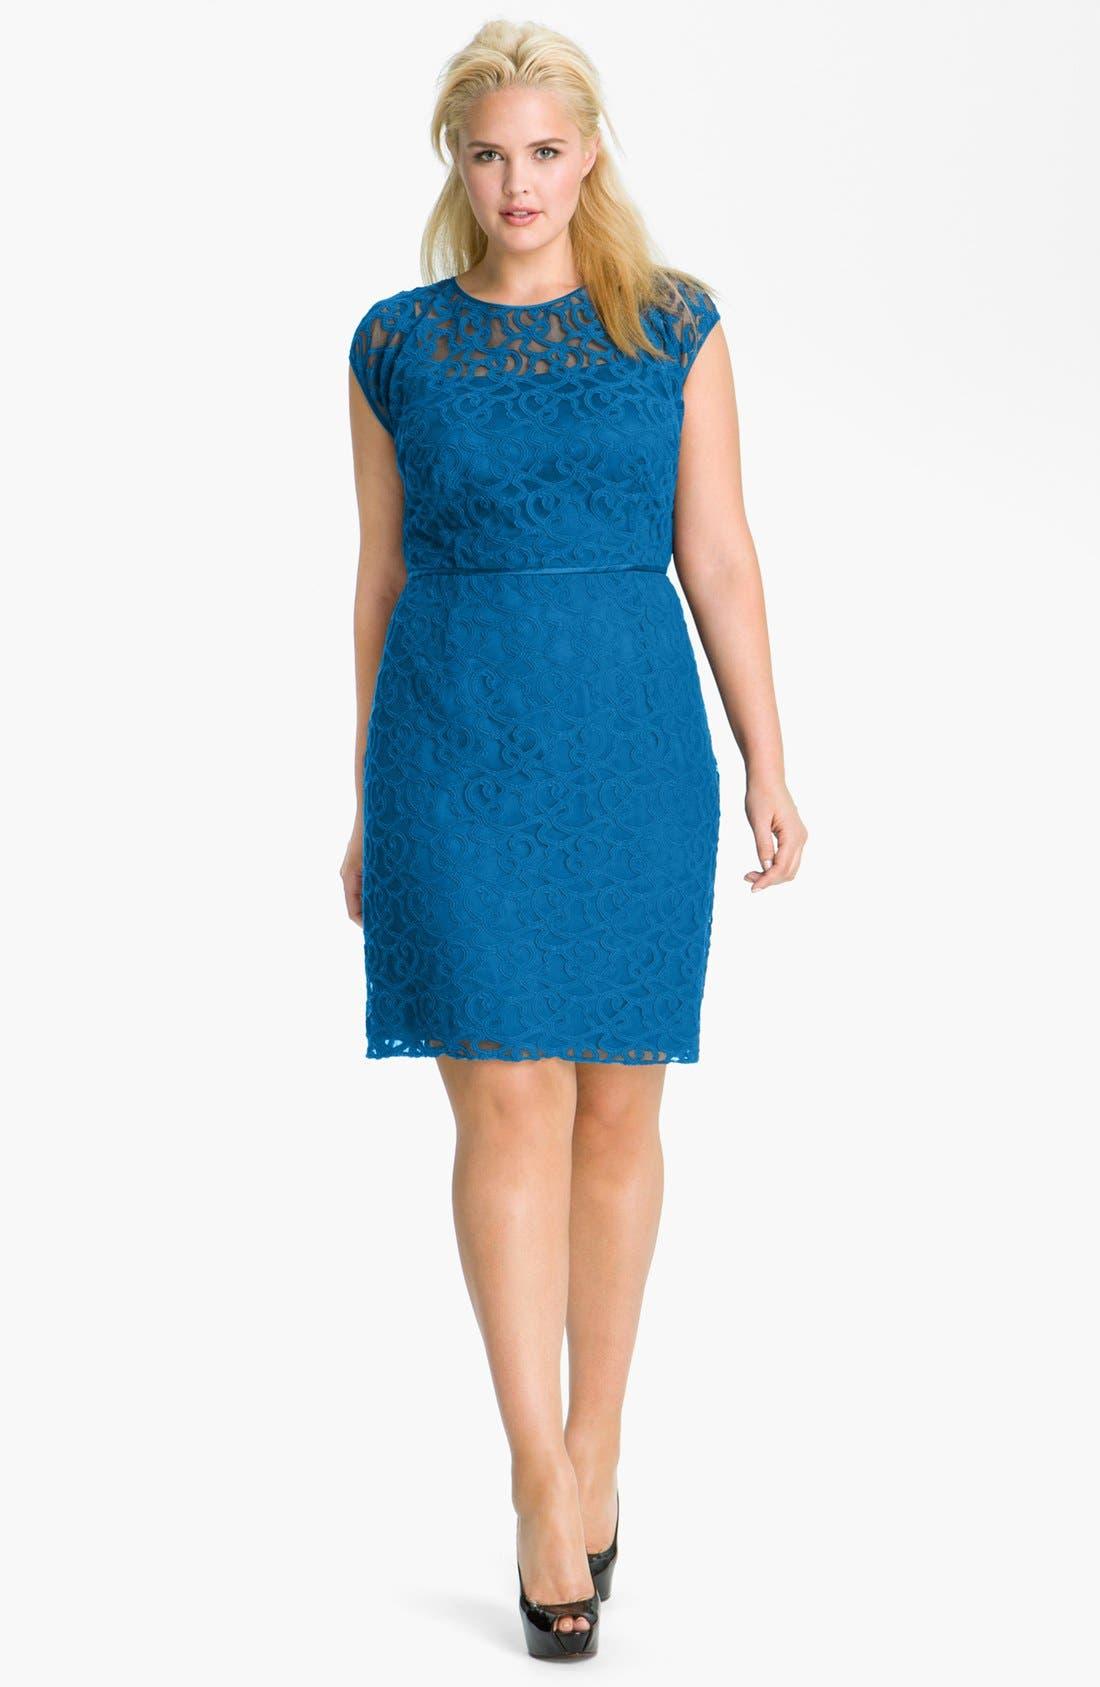 Main Image - Adrianna Papell Soutache Illusion Bodice Dress (Plus Size)